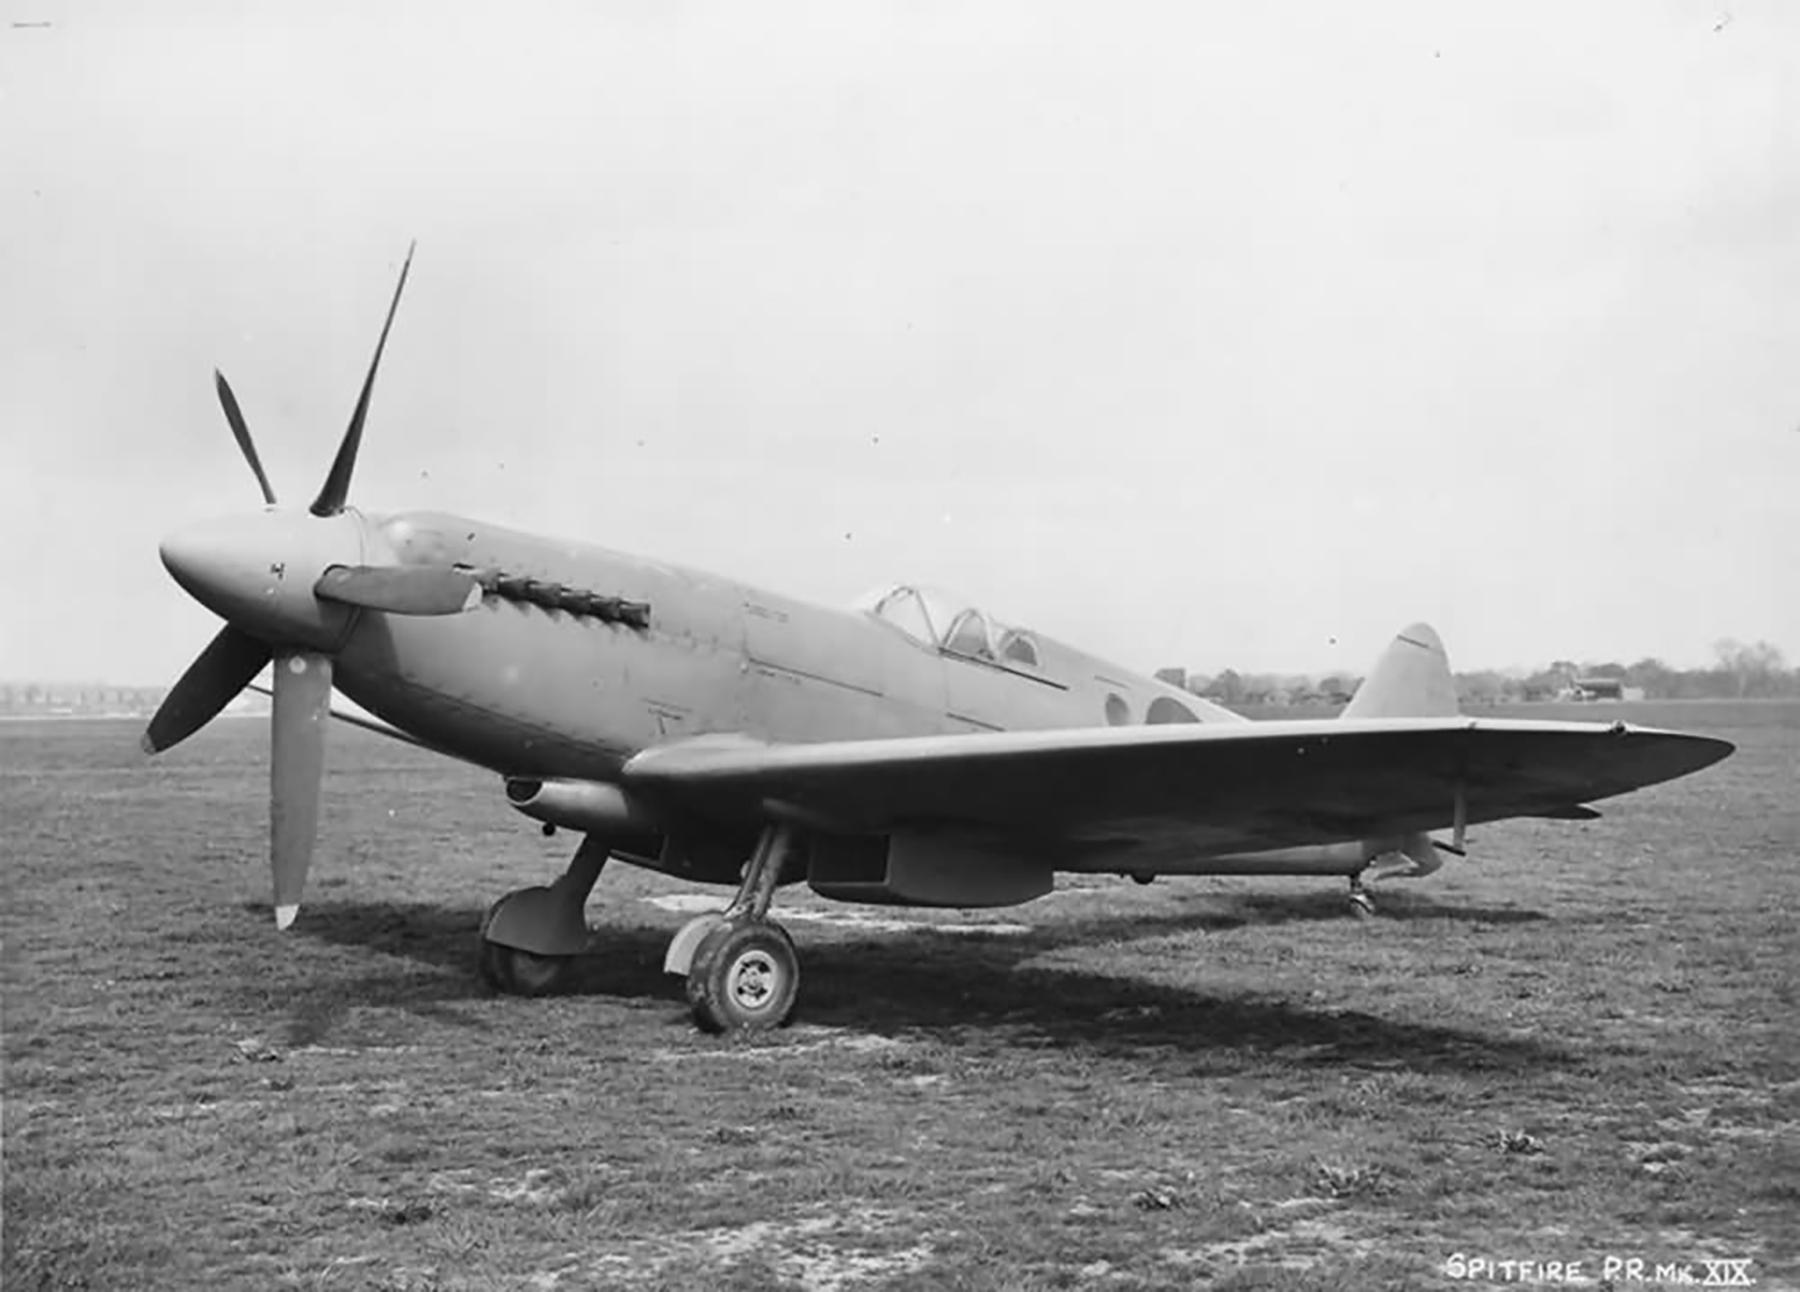 Spitfire PR19 RAF England May 1944 web 01